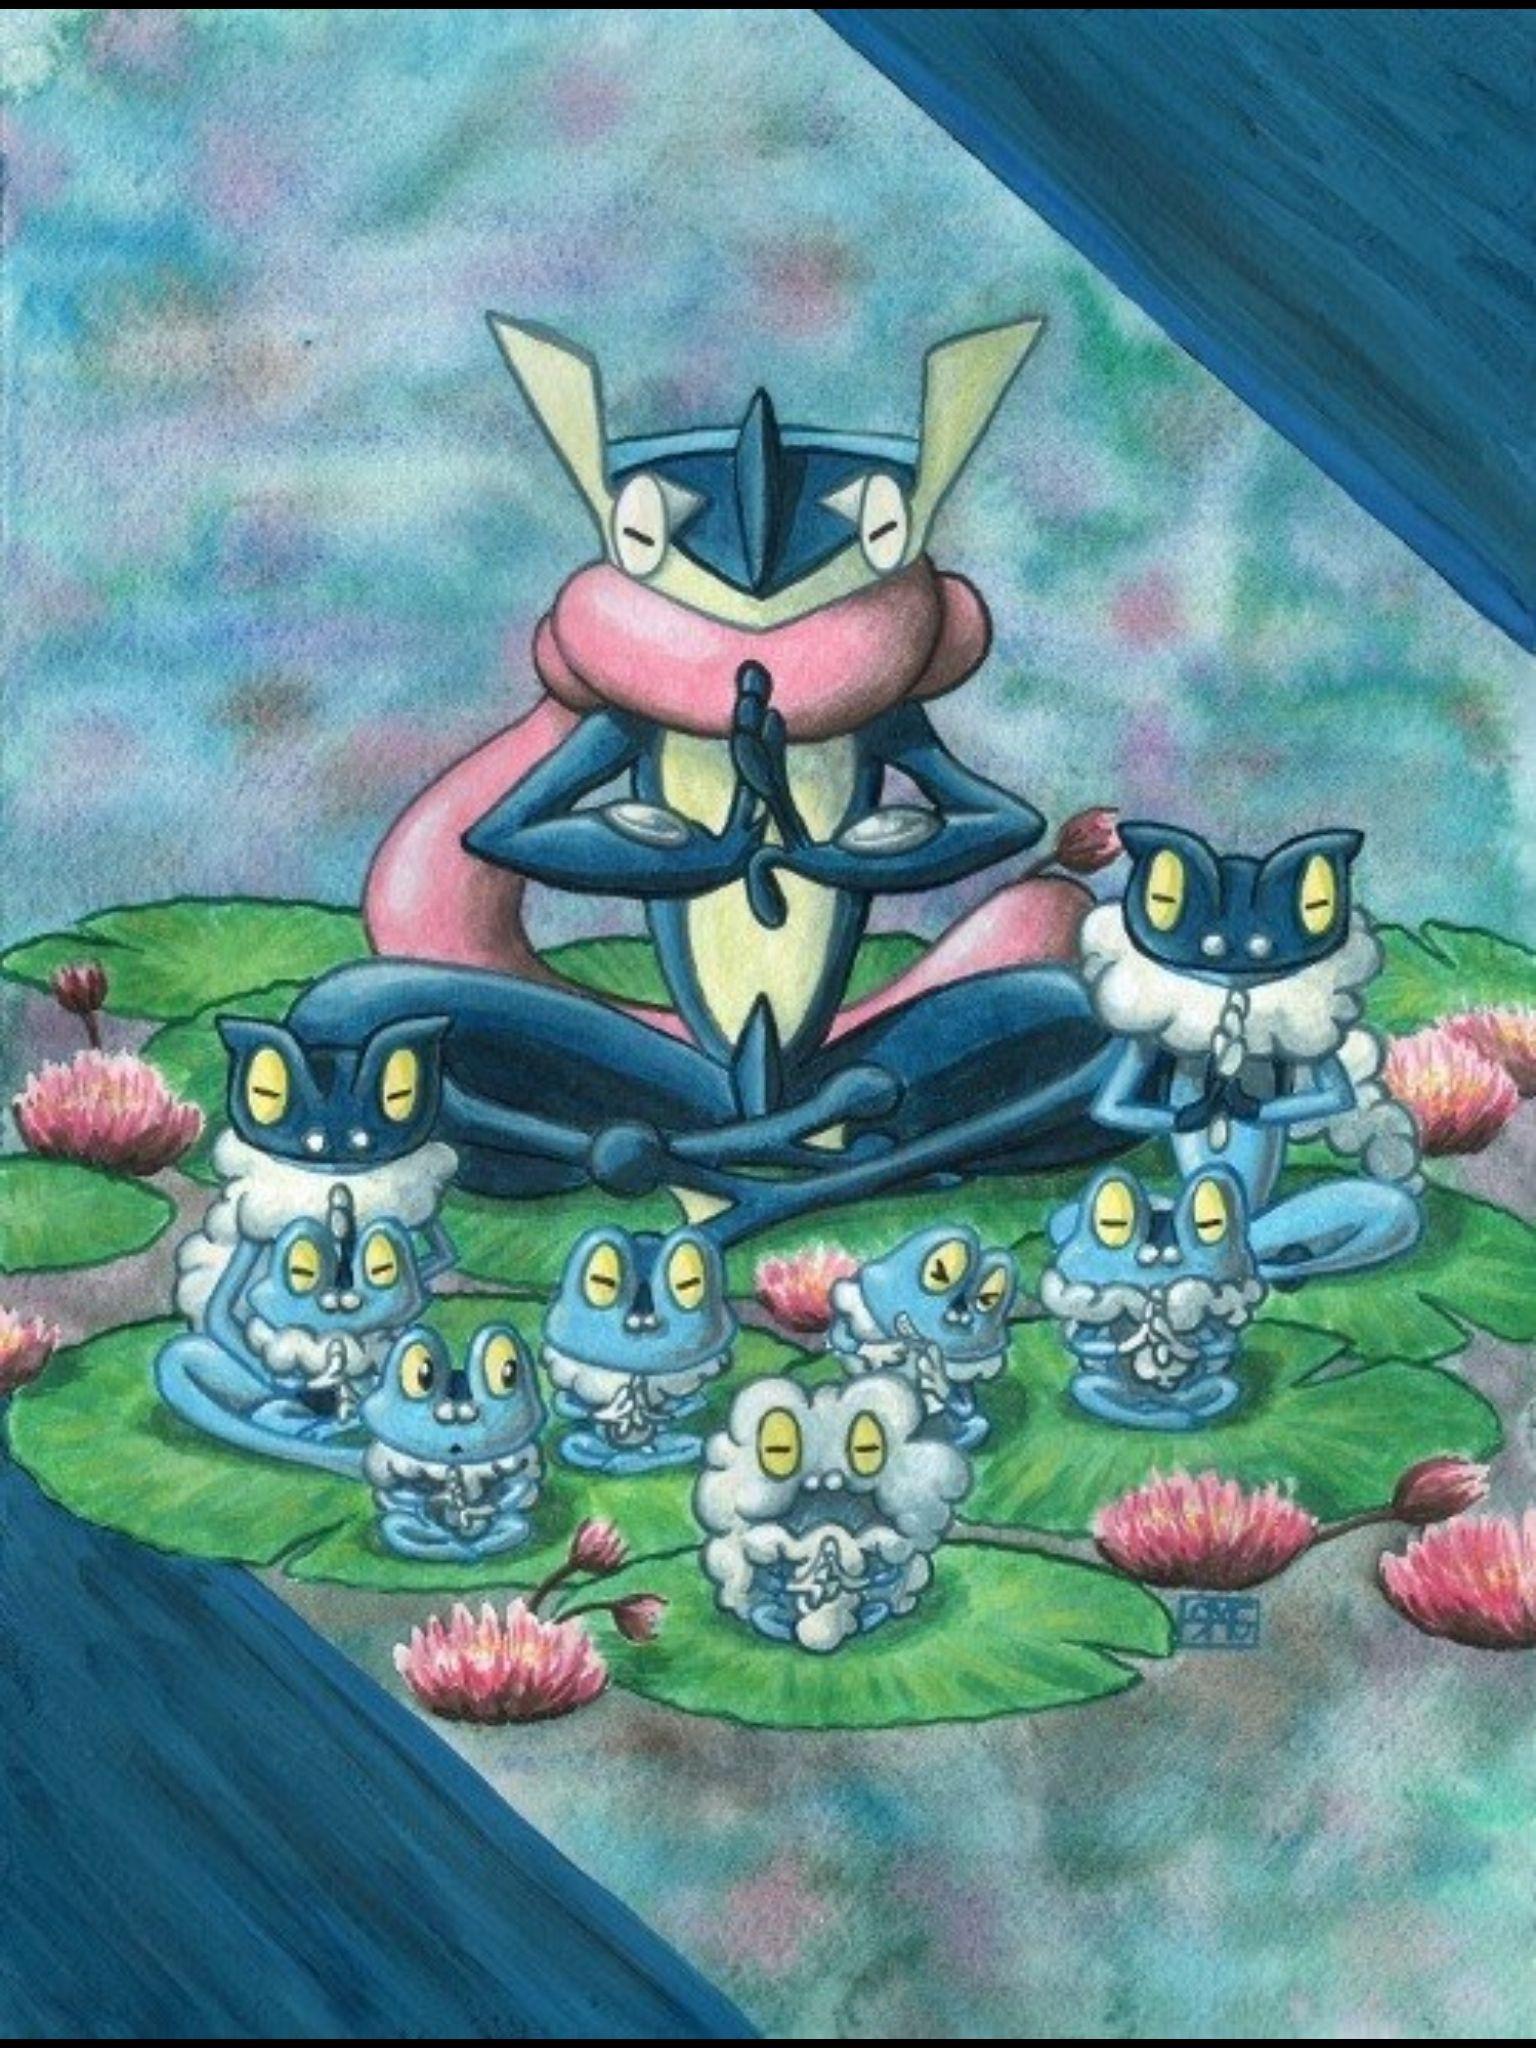 froakie frogadier and greninja pokemon pinterest fotos de